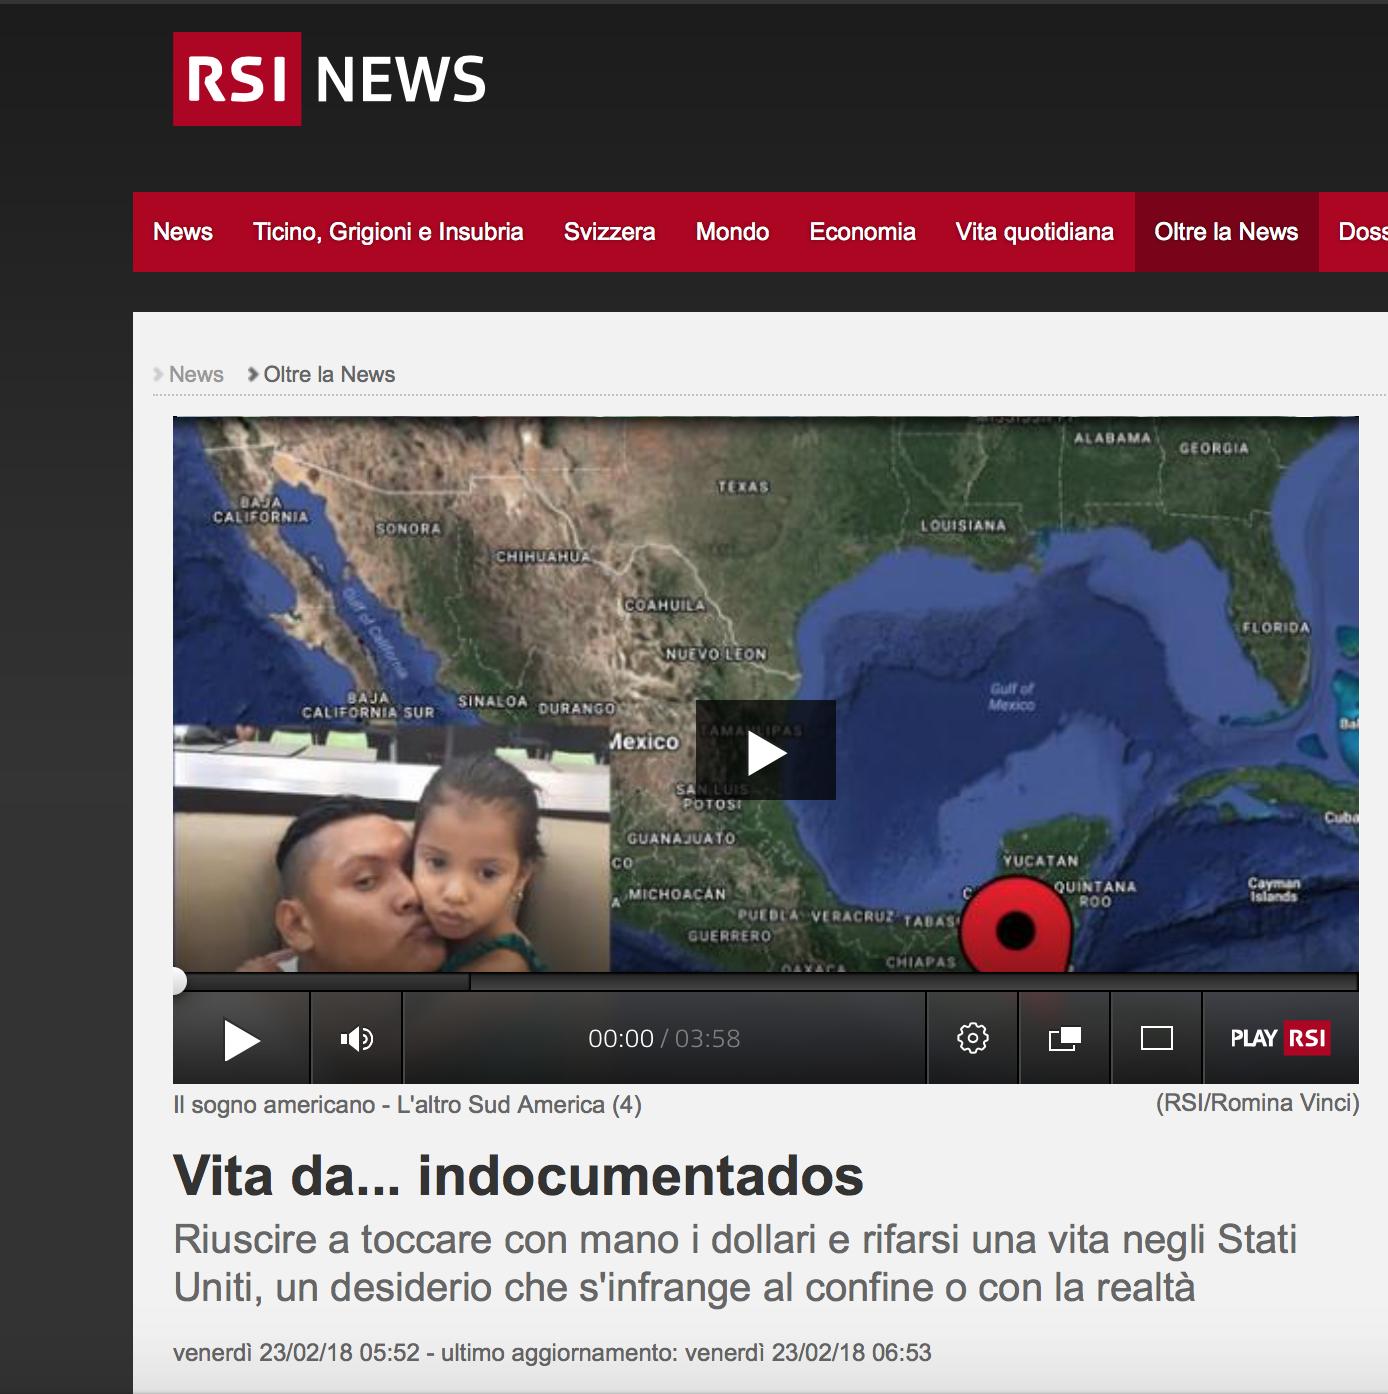 RSI - Radio Televisione Svizzera - February 2018